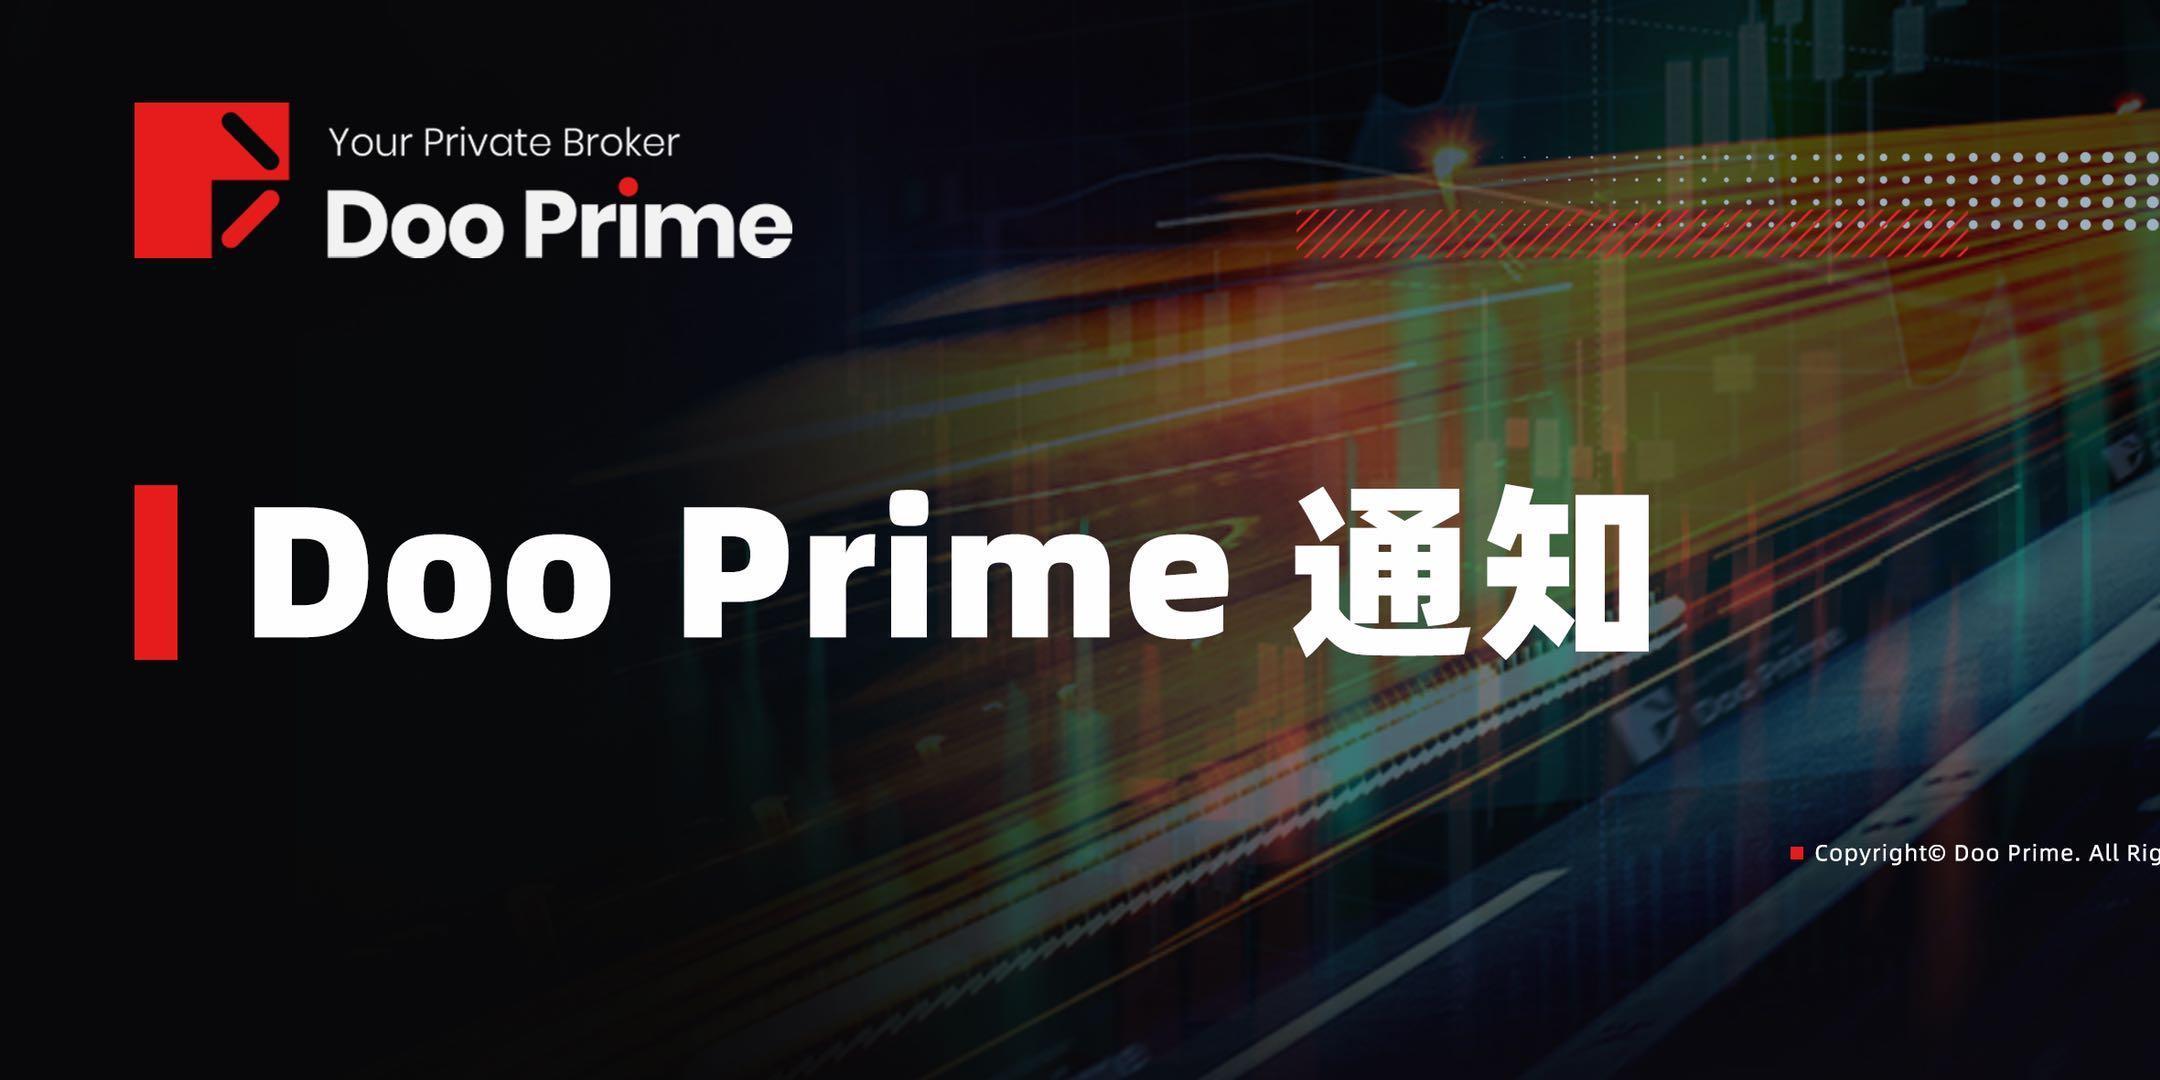 Doo Prime 美股品种下架